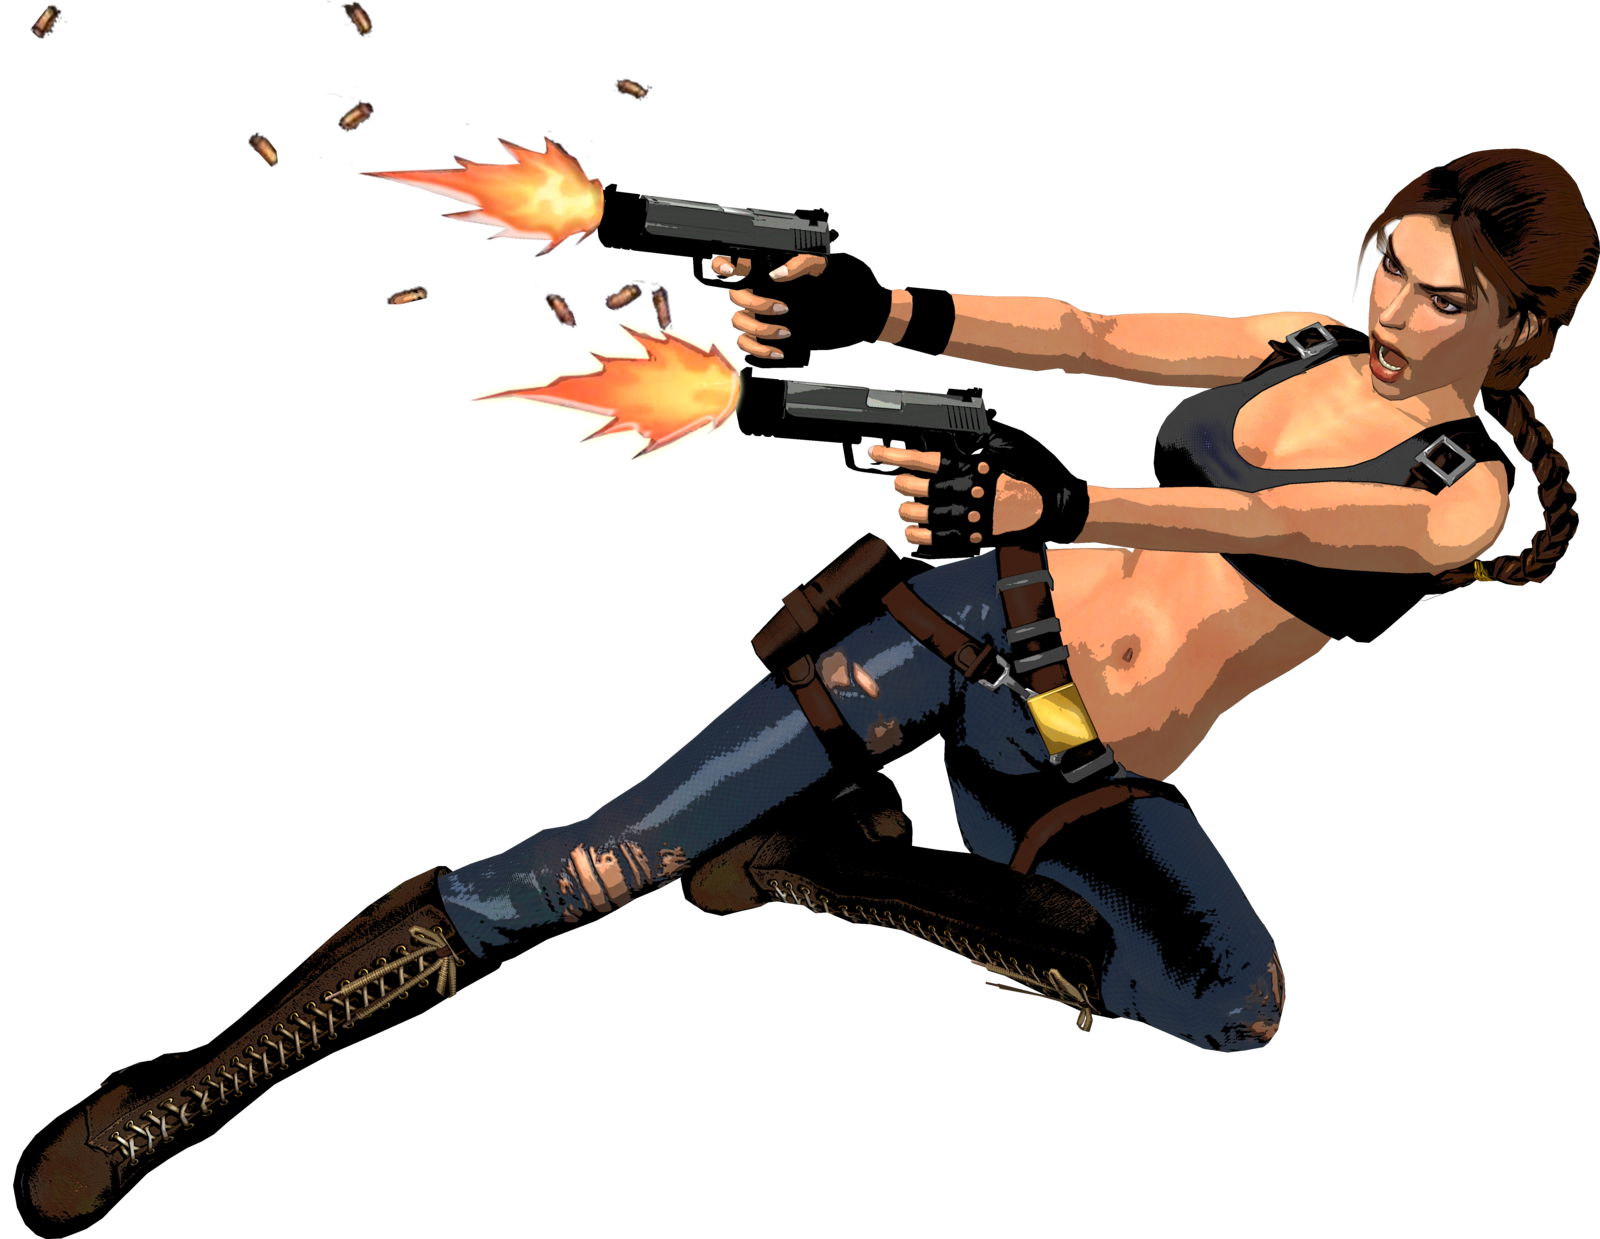 Lara Croft Tomb Raider With Guns Png Image Lara Croft Tomb Tomb Raider Tomb